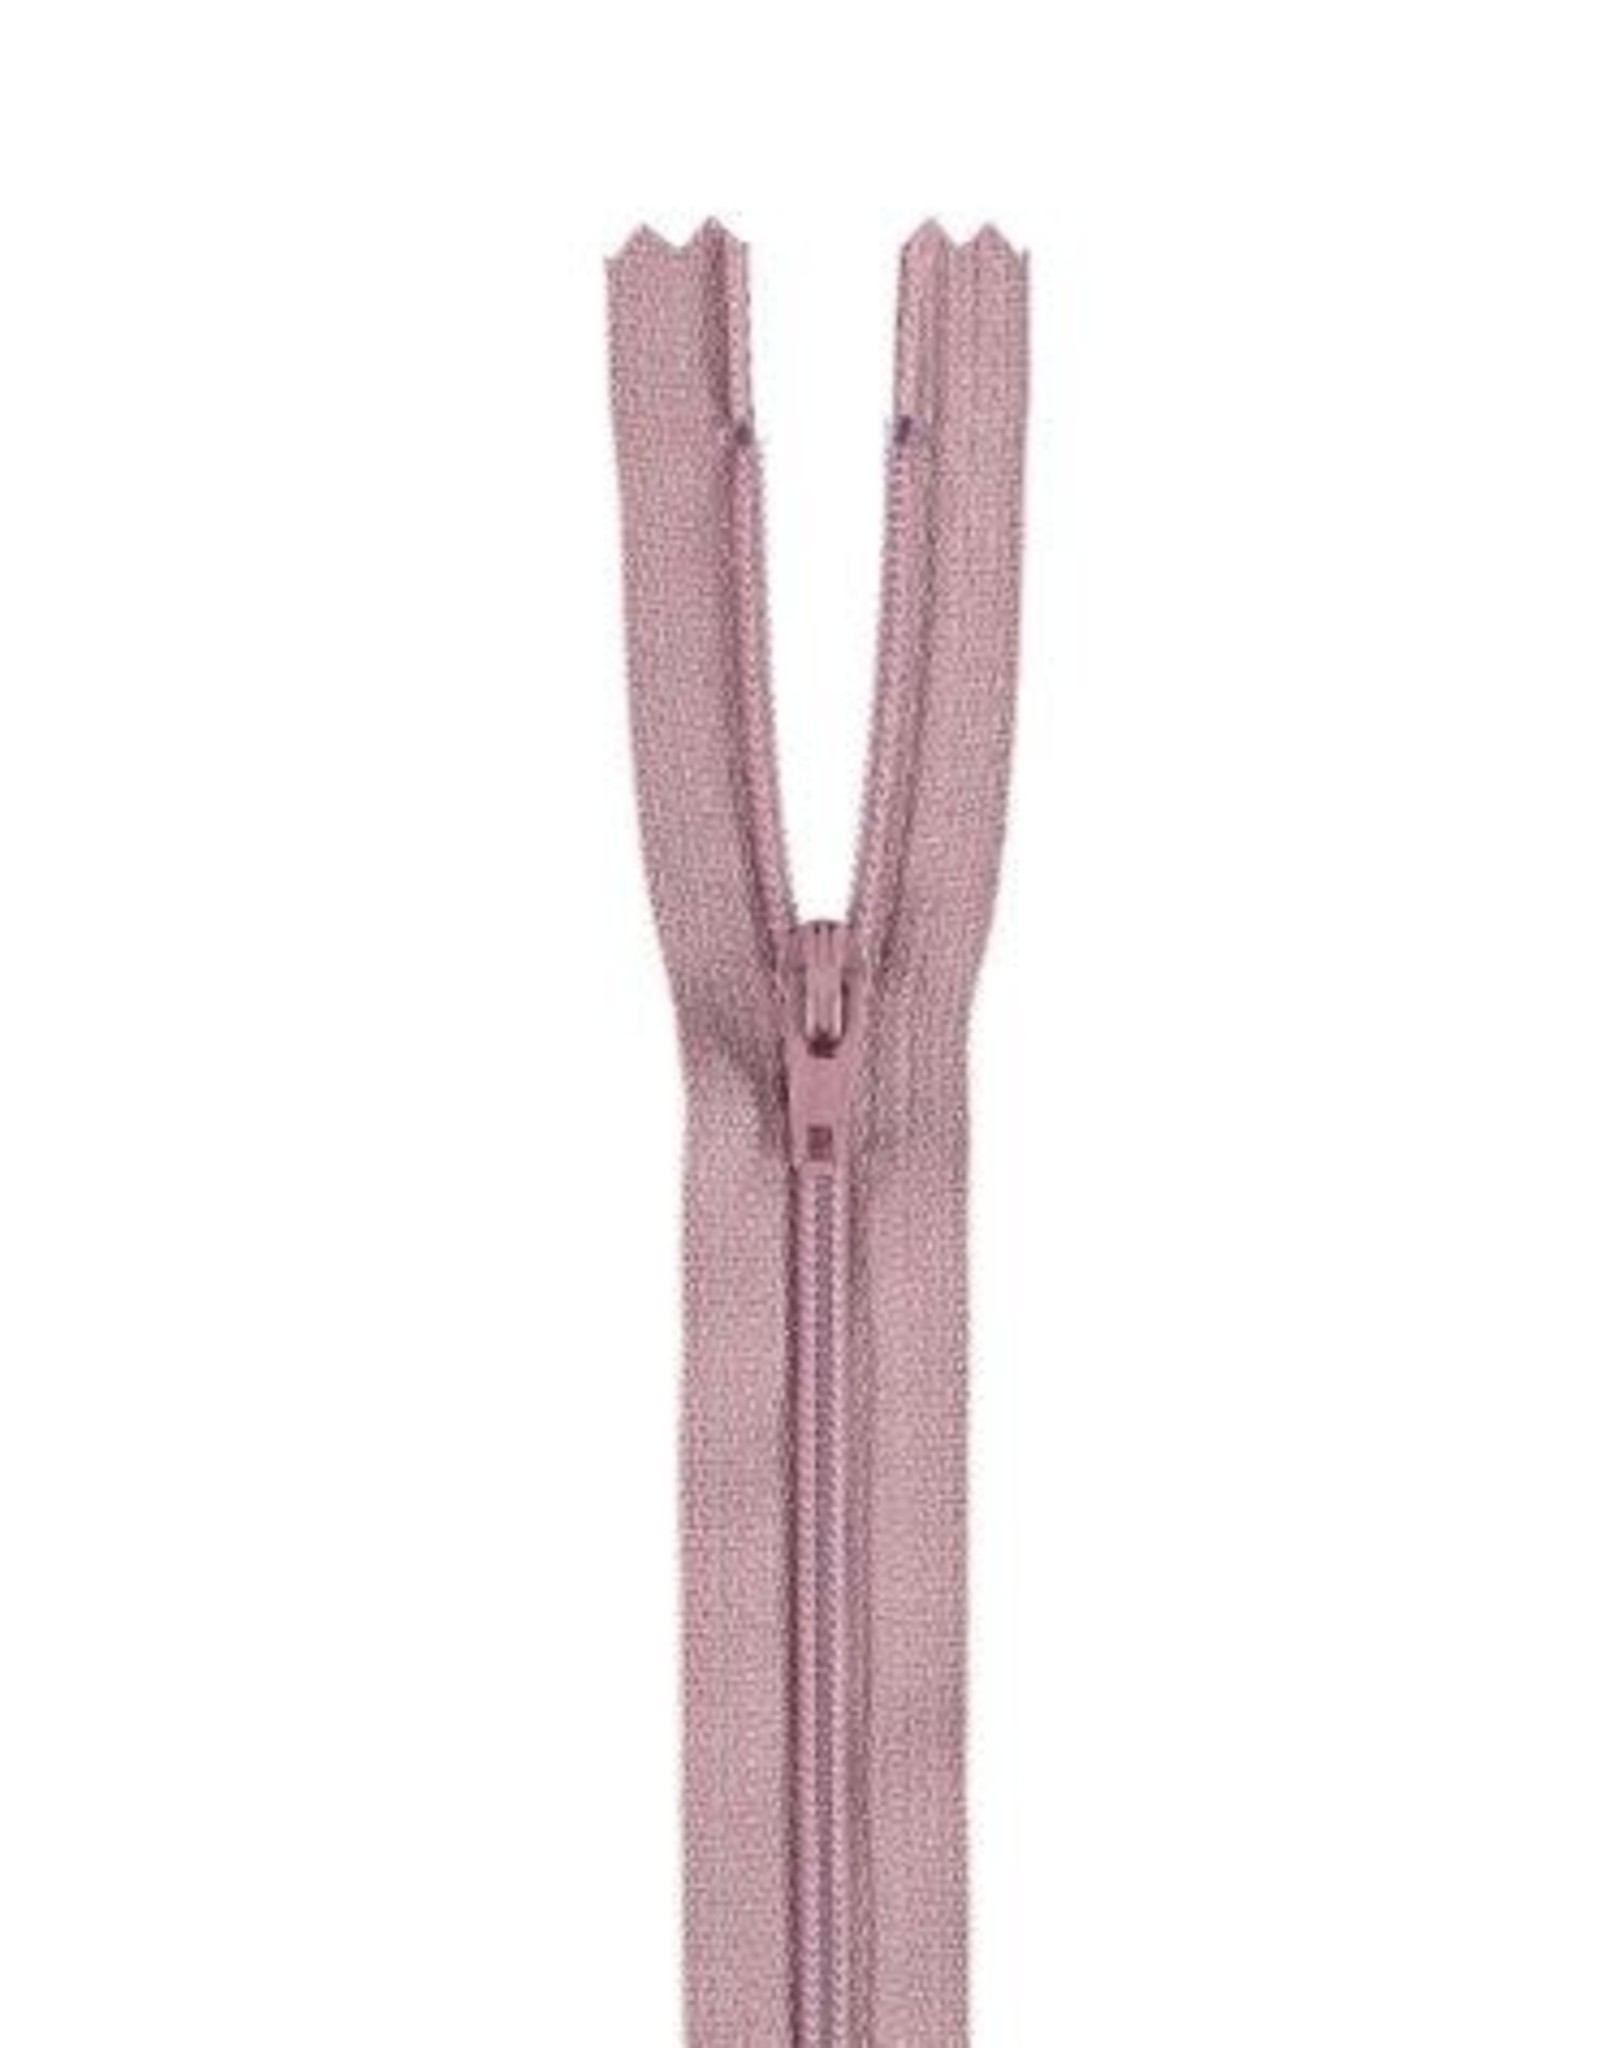 YKK Spiraalrits niet-DB 3mm oud roze 069-30cm